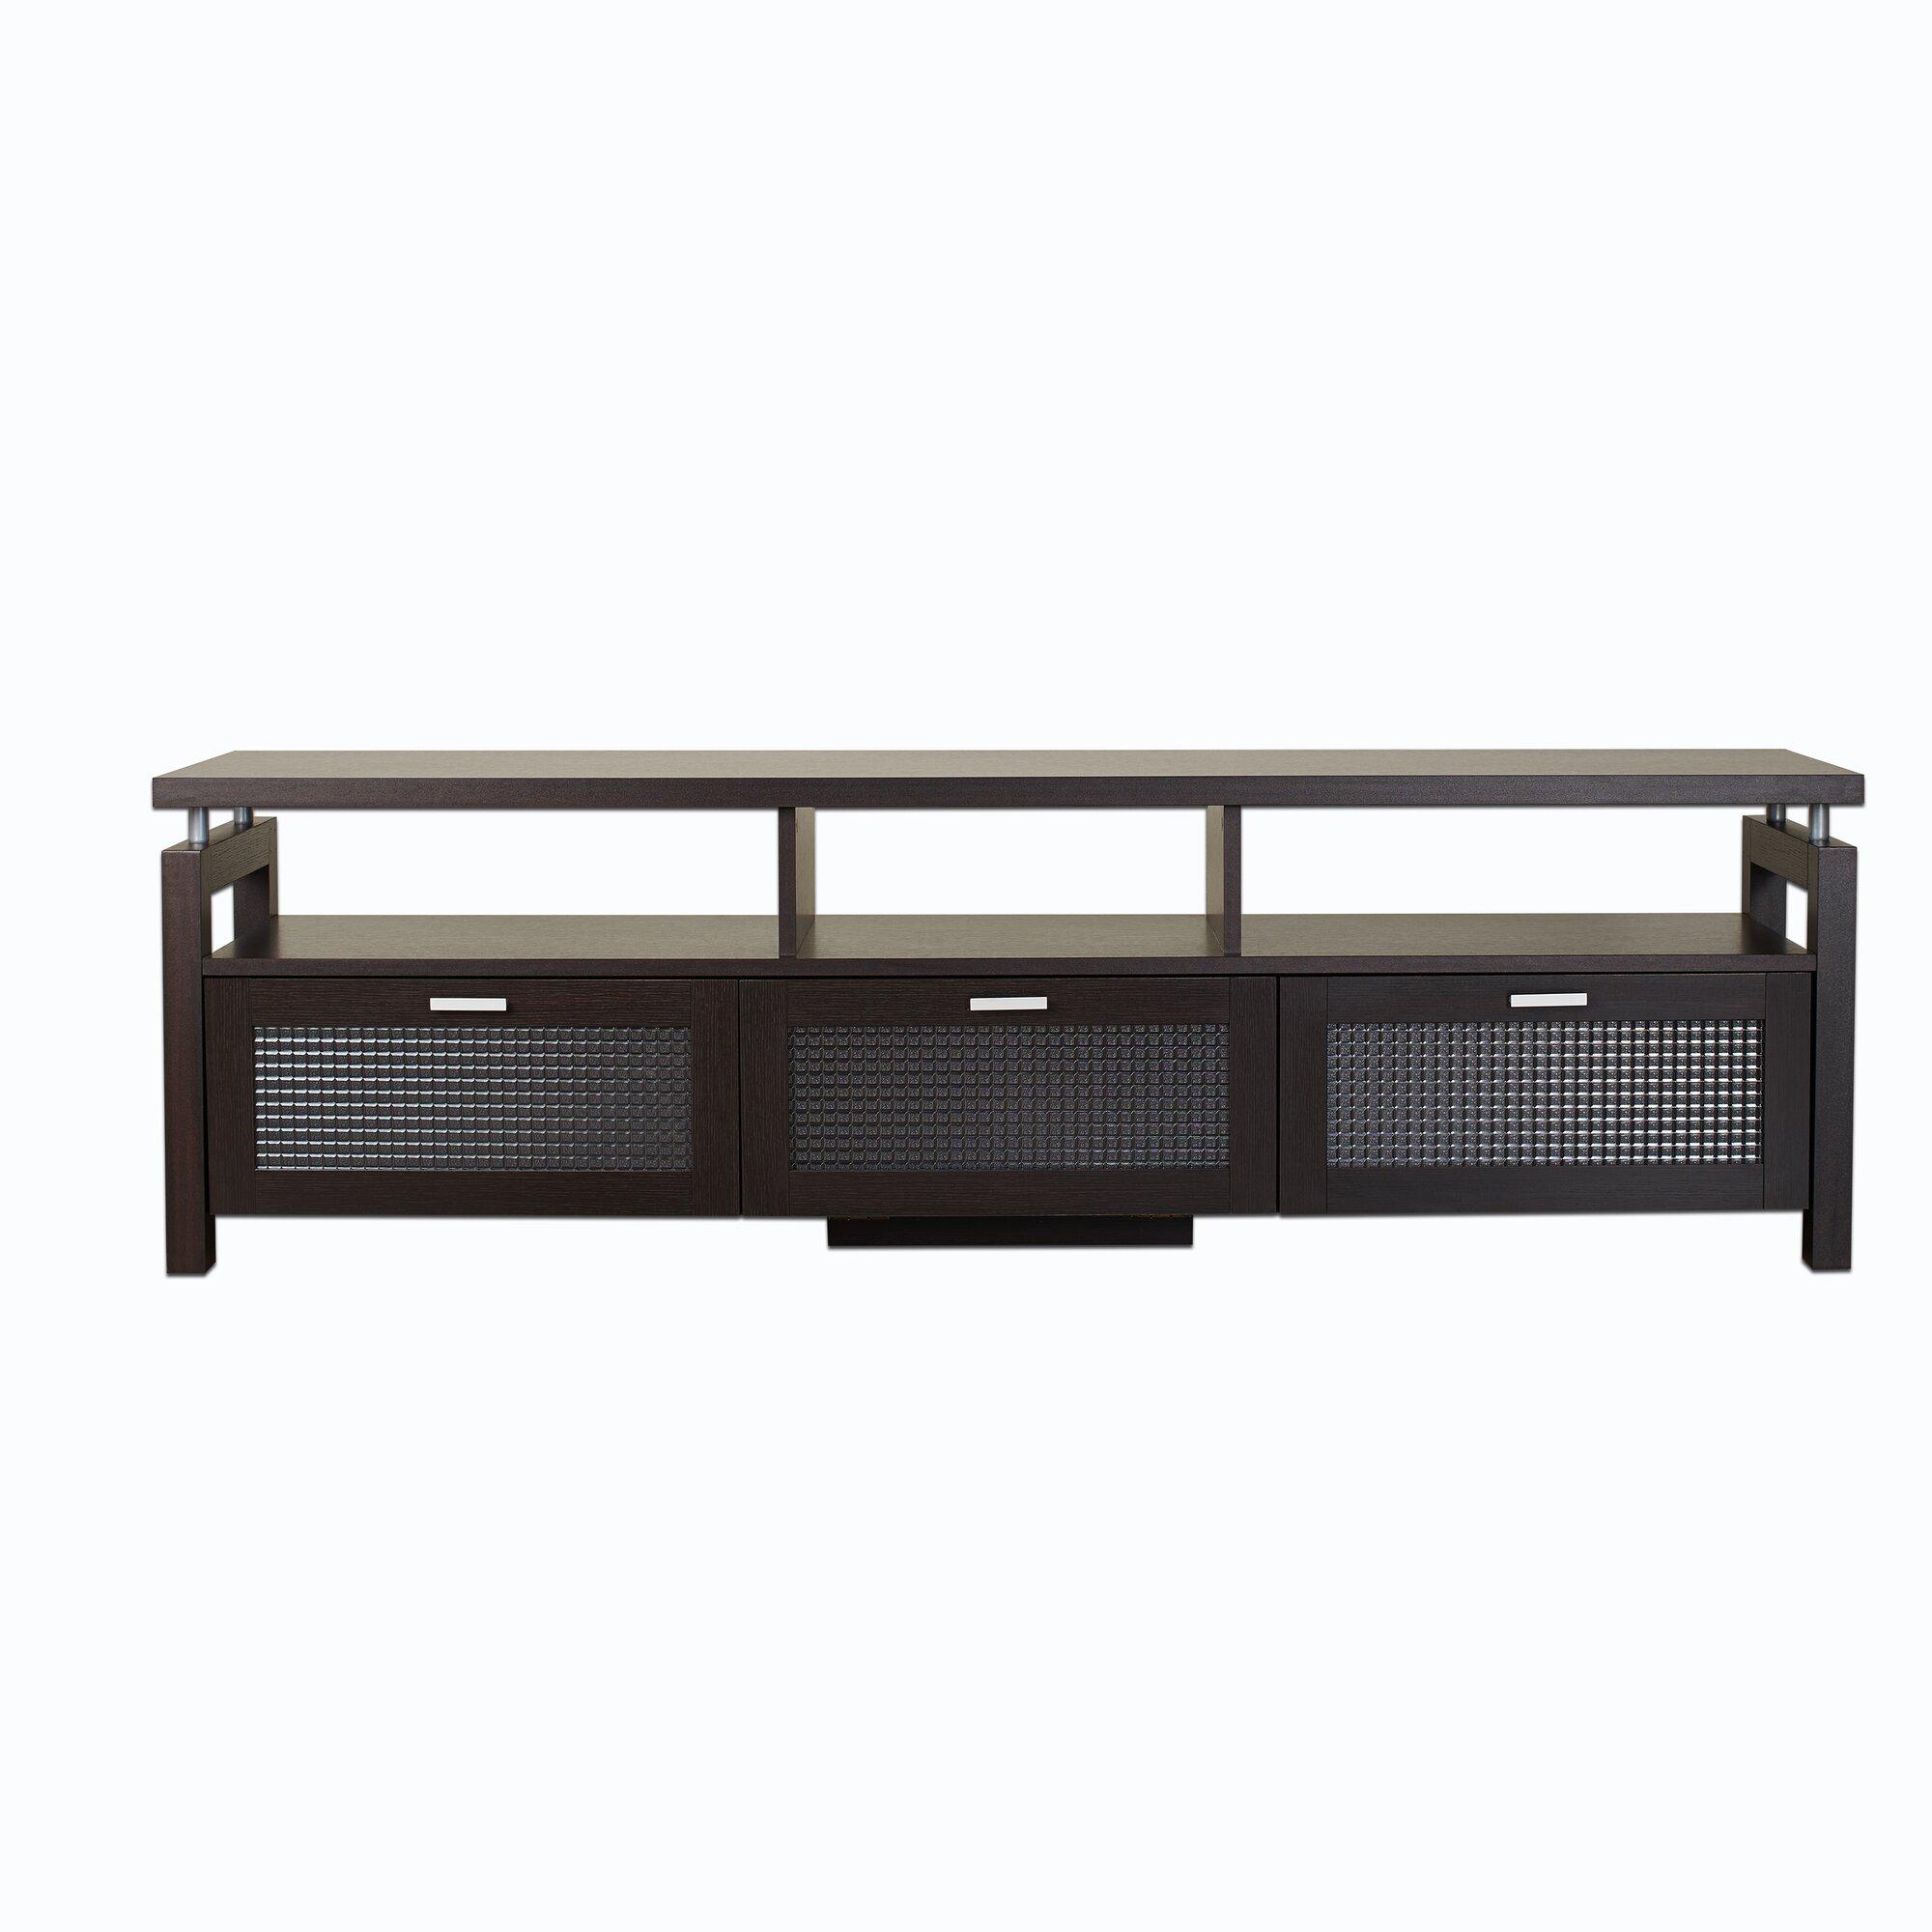 Hokku Designs Hokku Designs Bonaventure 71 Tv Stand Reviews Wayfair Supply